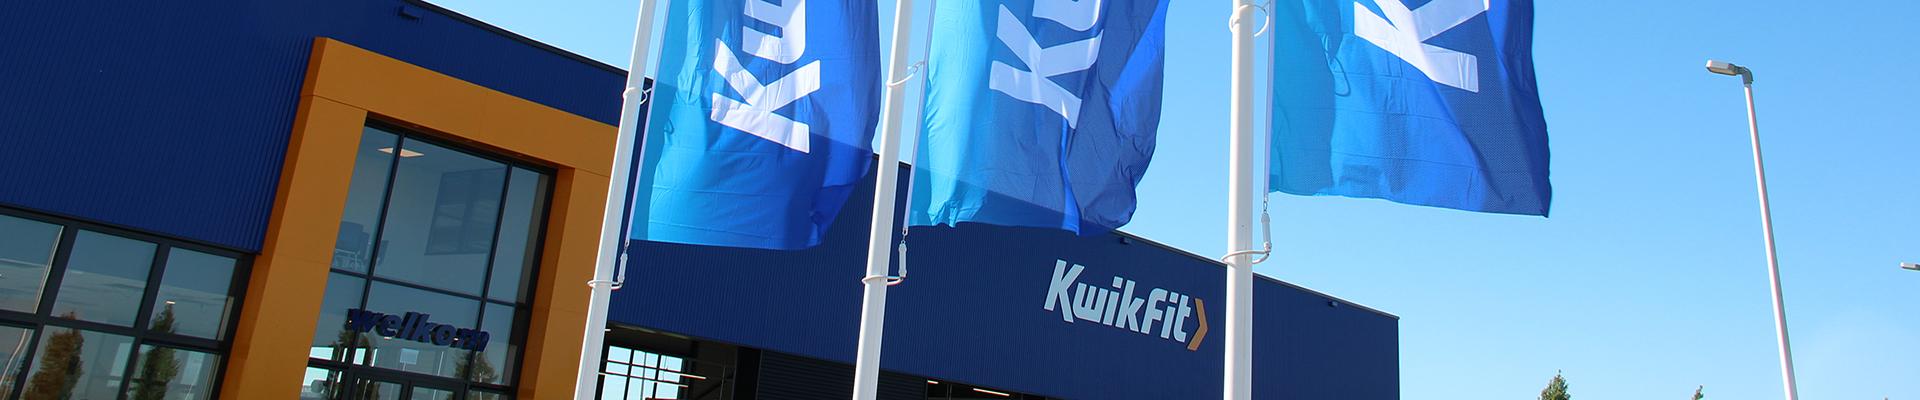 Kwikfit Autoservice Apk Banden Onderhoud Airco Accu